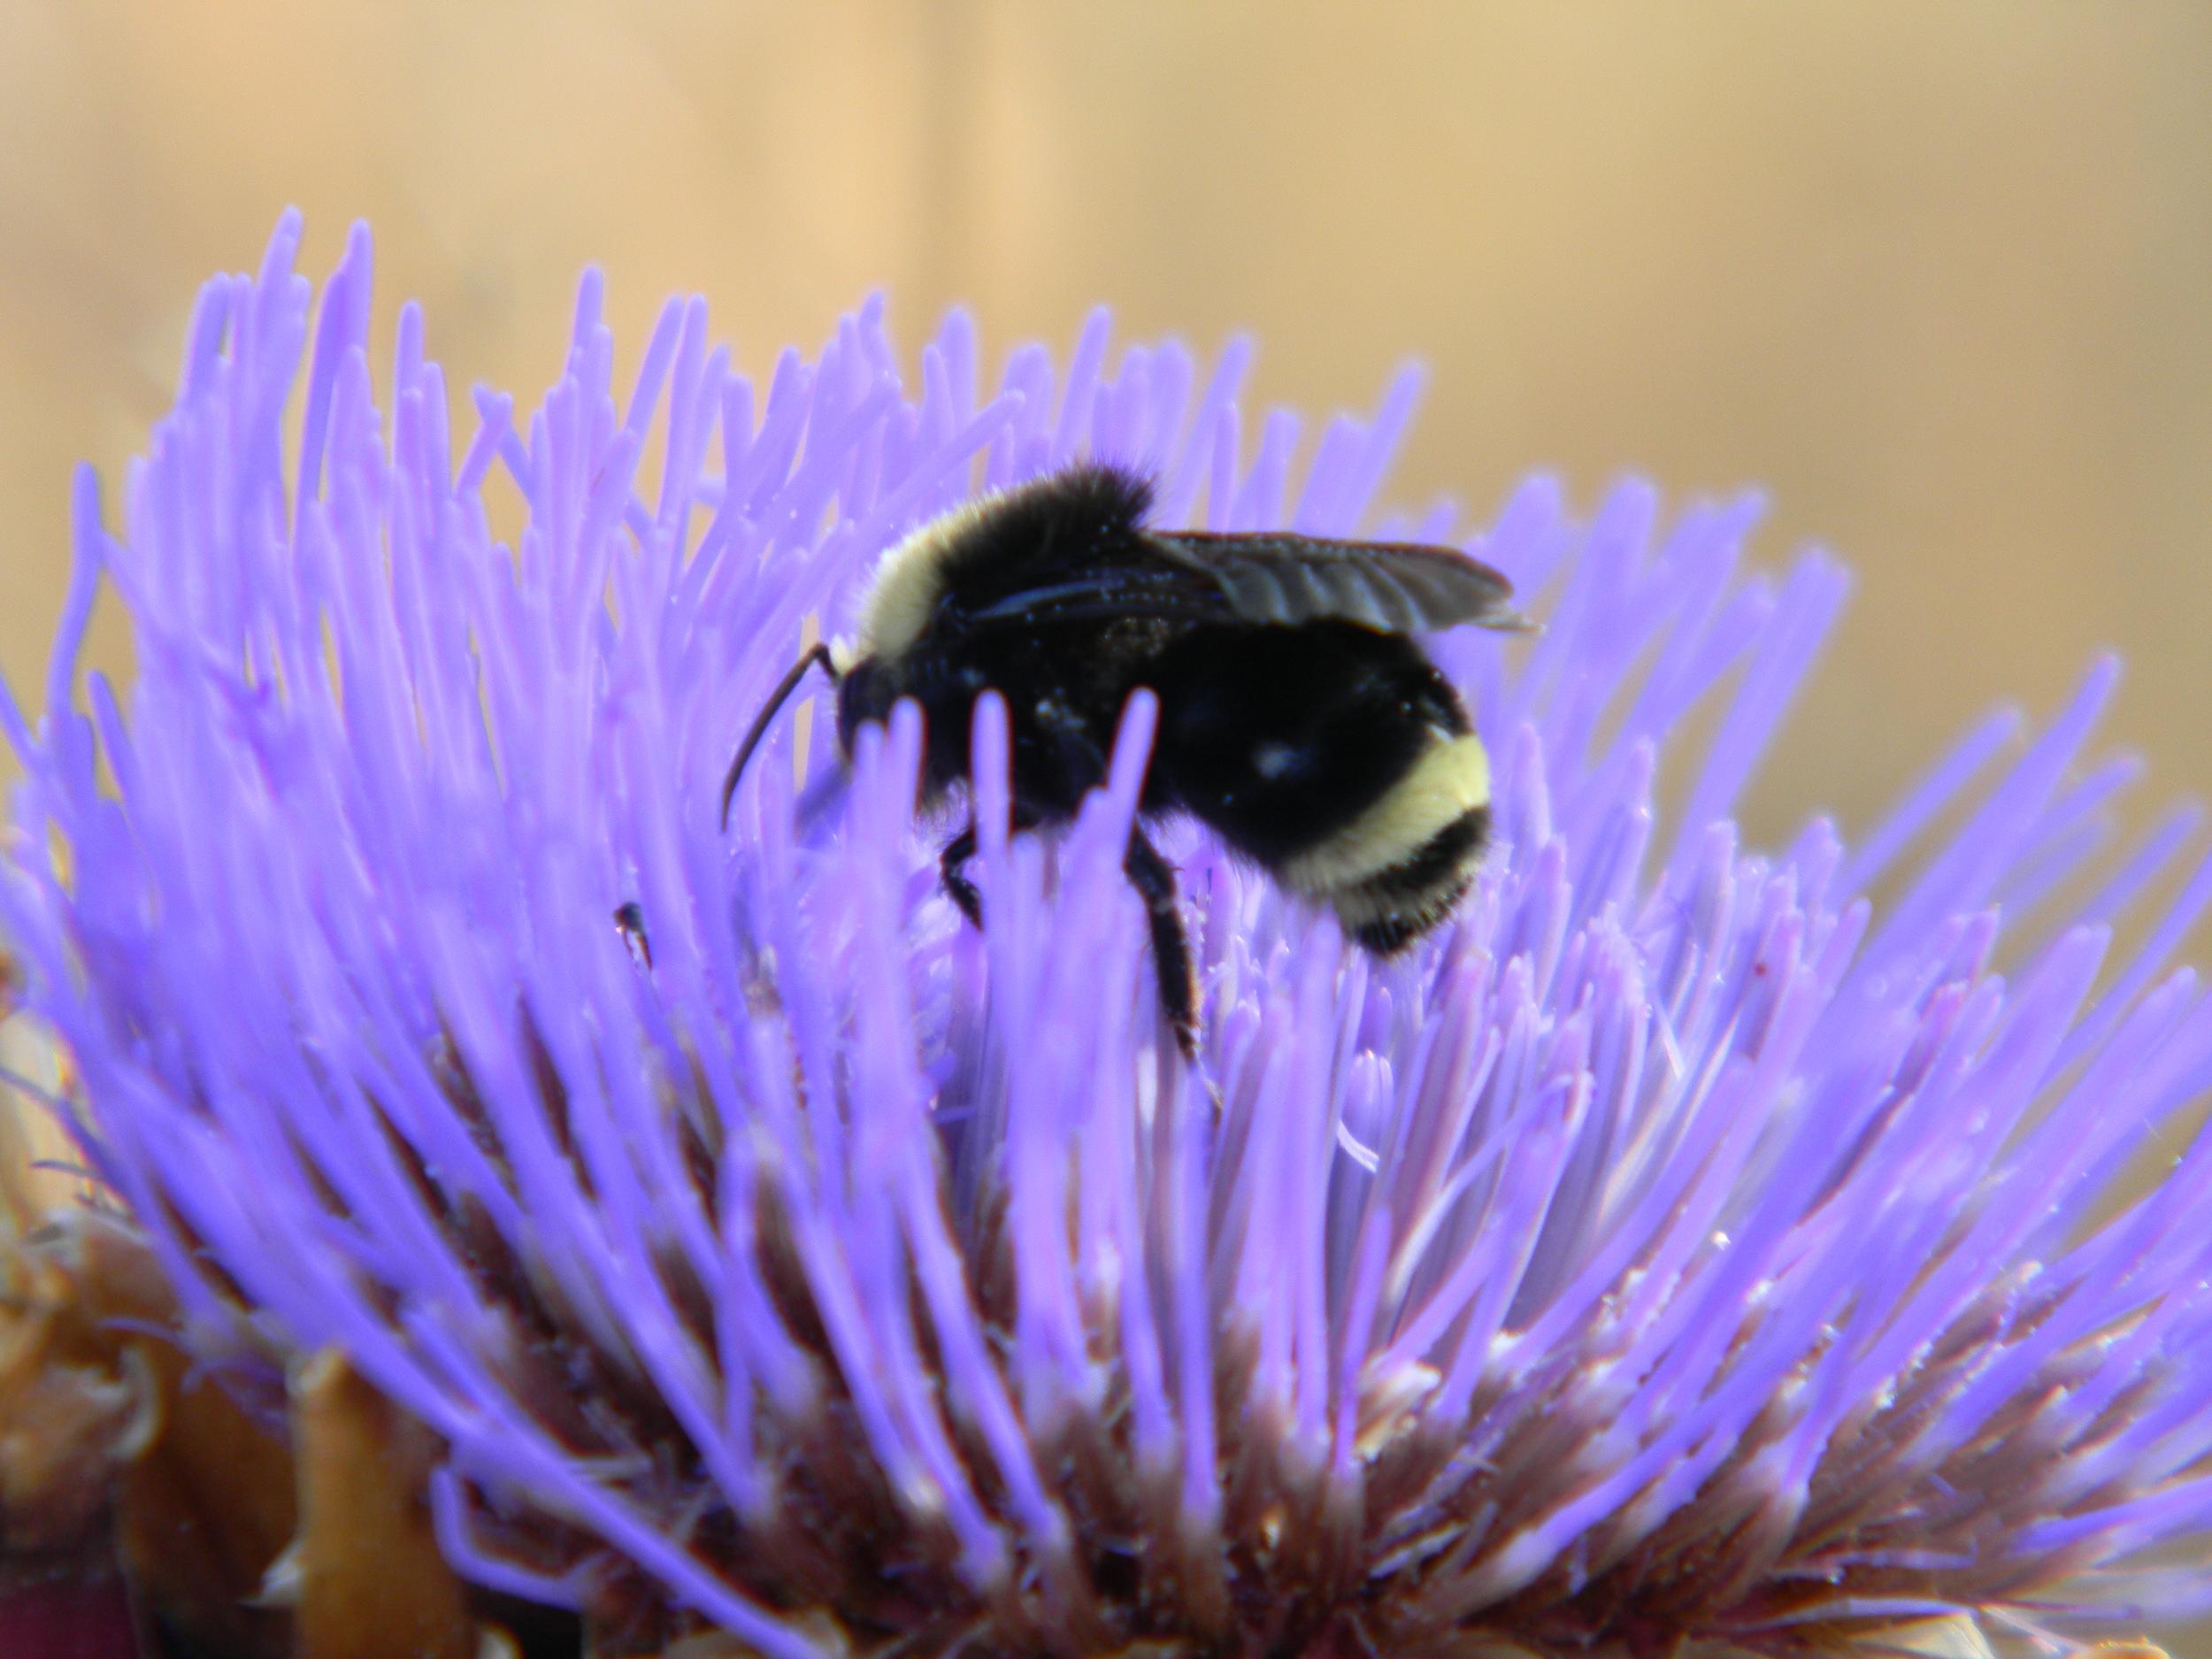 Bee pollinating a Late Summer Cardoon